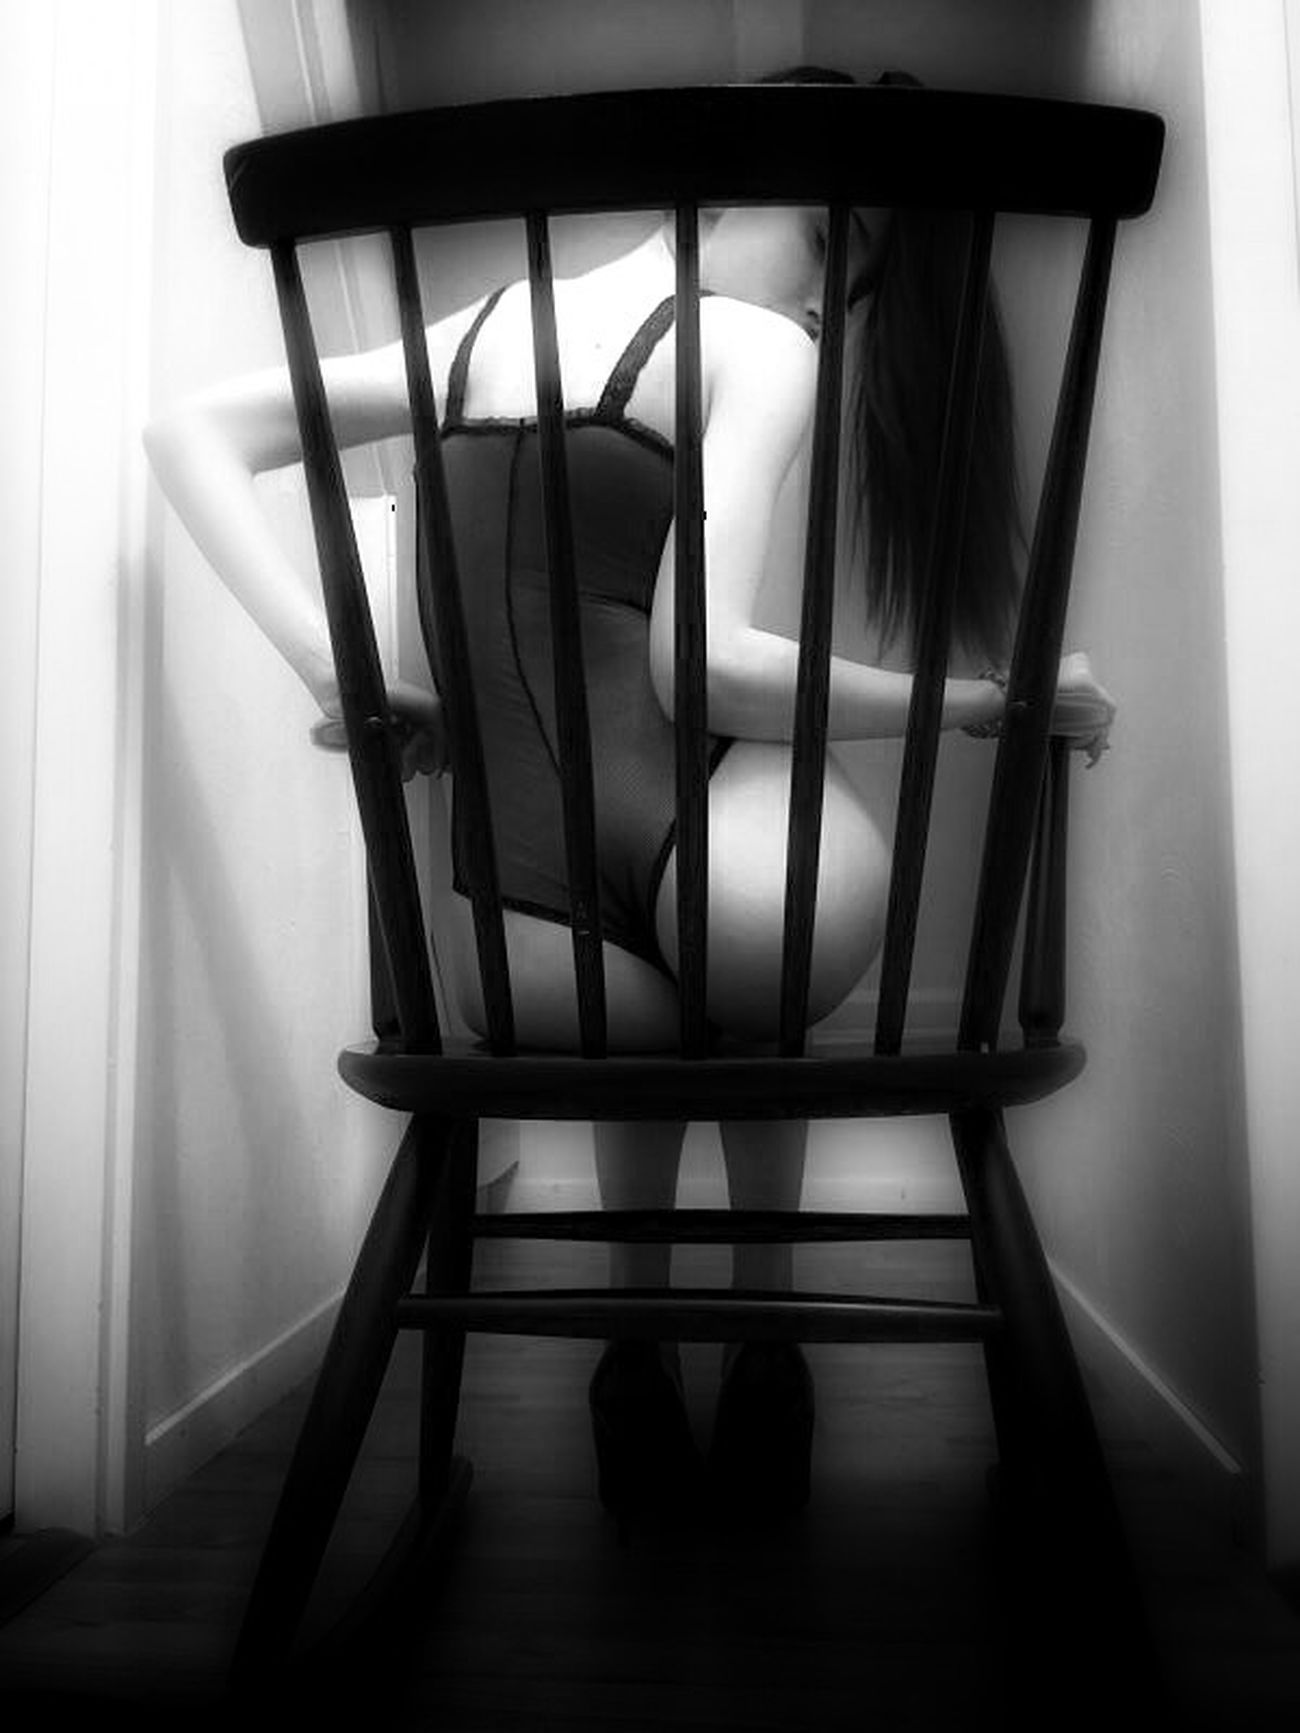 Woman Black And White EyeEm Best Shots EyeEm Best Edits Chair Details